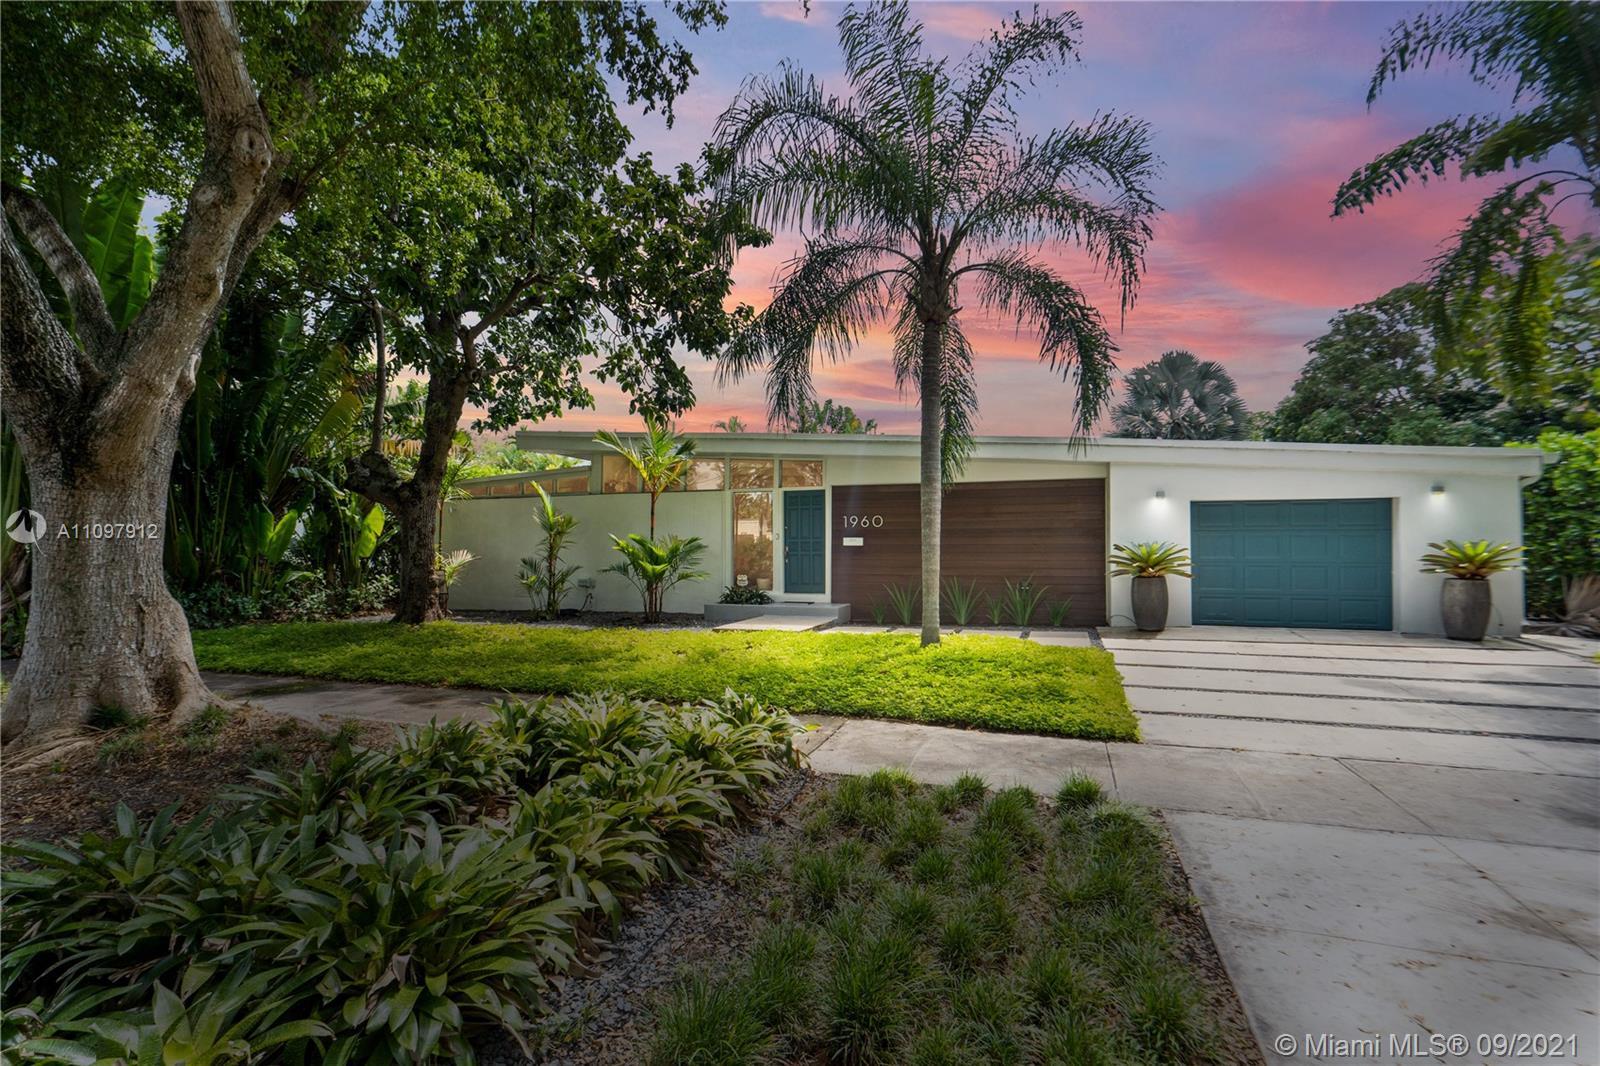 Single Family Home,For Sale,1960 Keystone Blvd, North Miami, Florida 33181,Brickell,realty,broker,condos near me